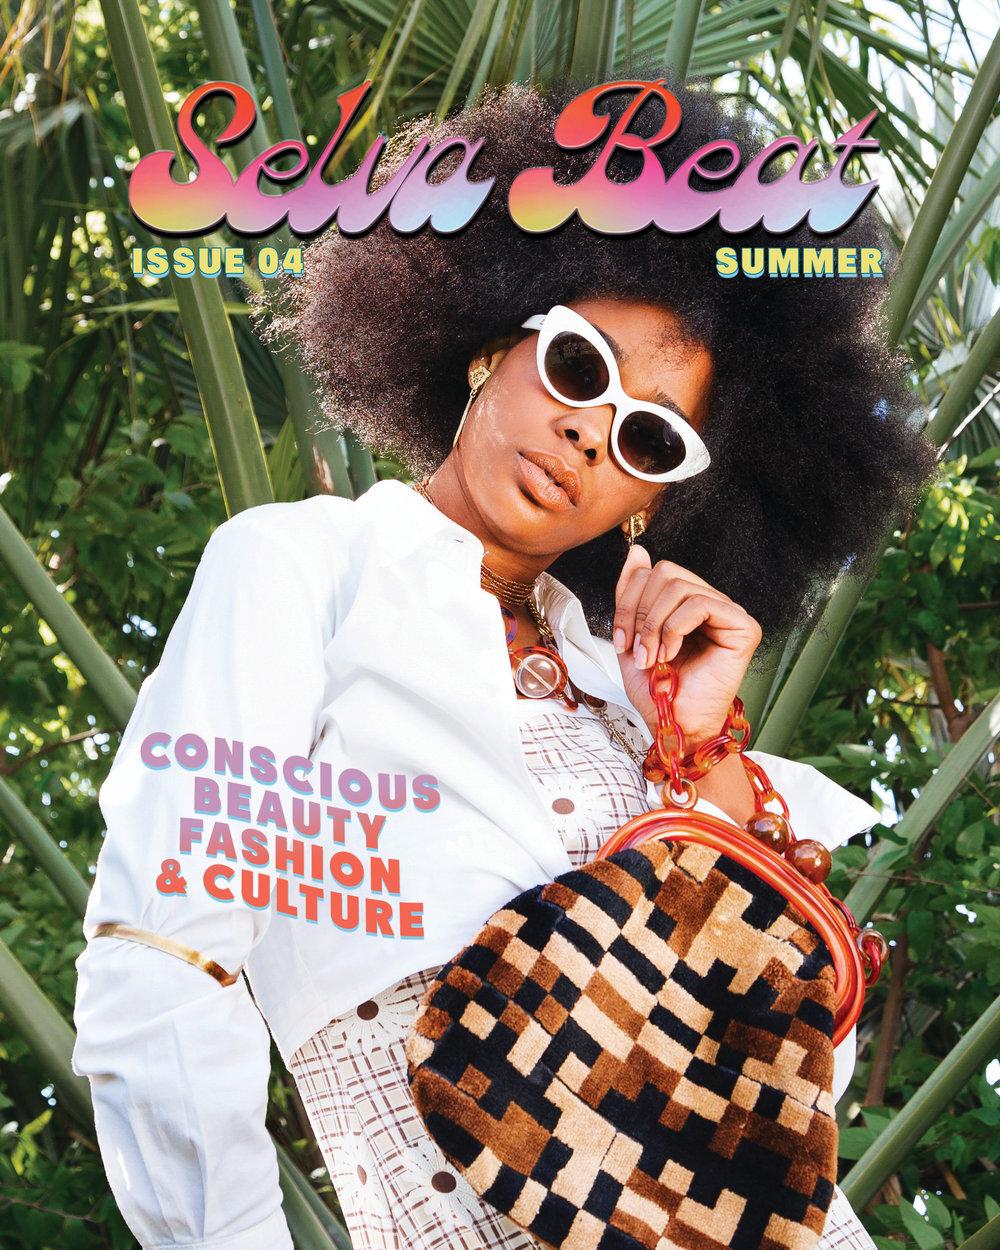 Selva Beat Magazine